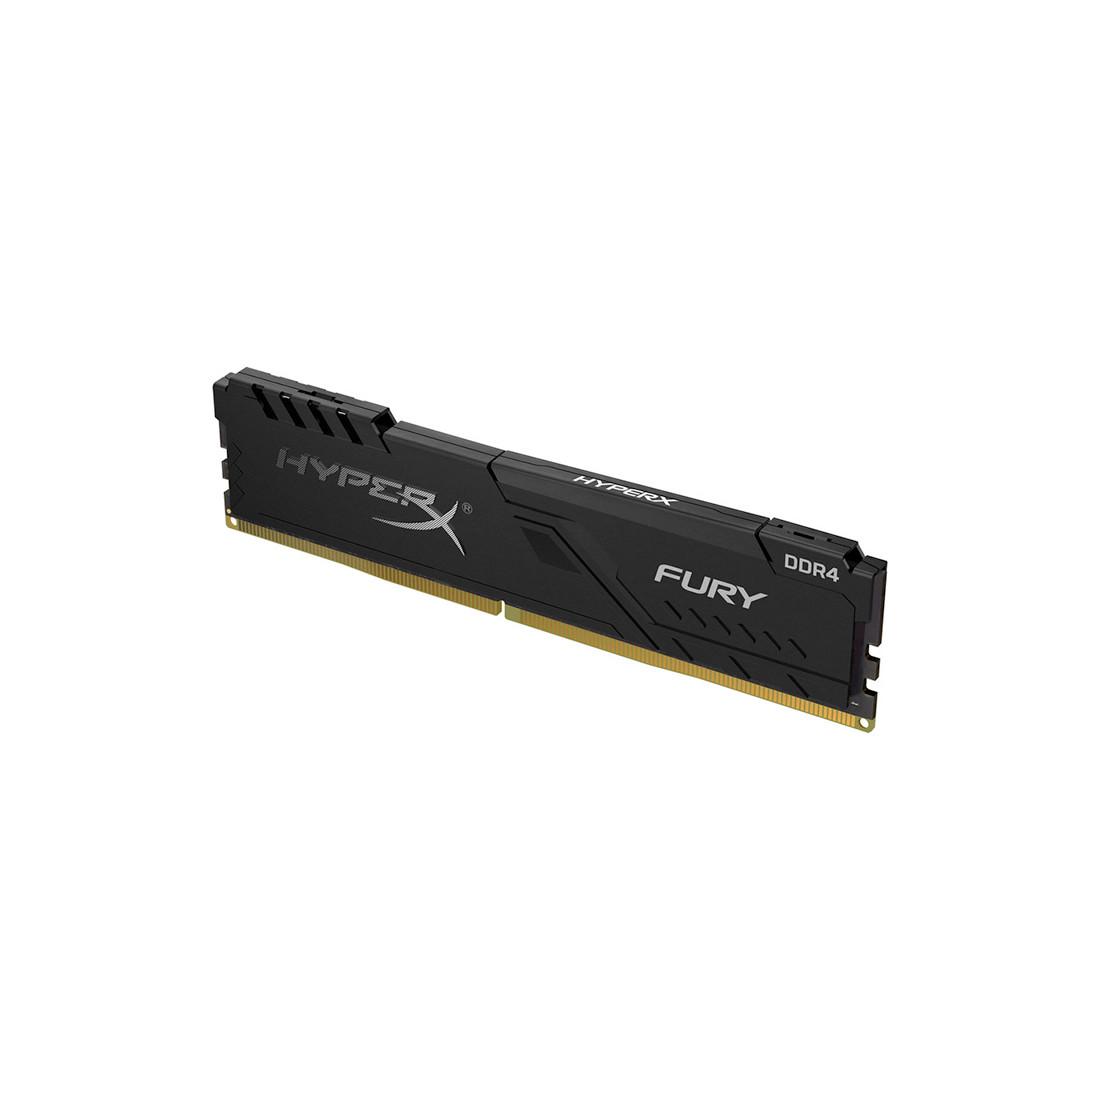 Модуль памяти Kingston HyperX Fury HX432C16FB3/16 DDR4 16G 3200MHz